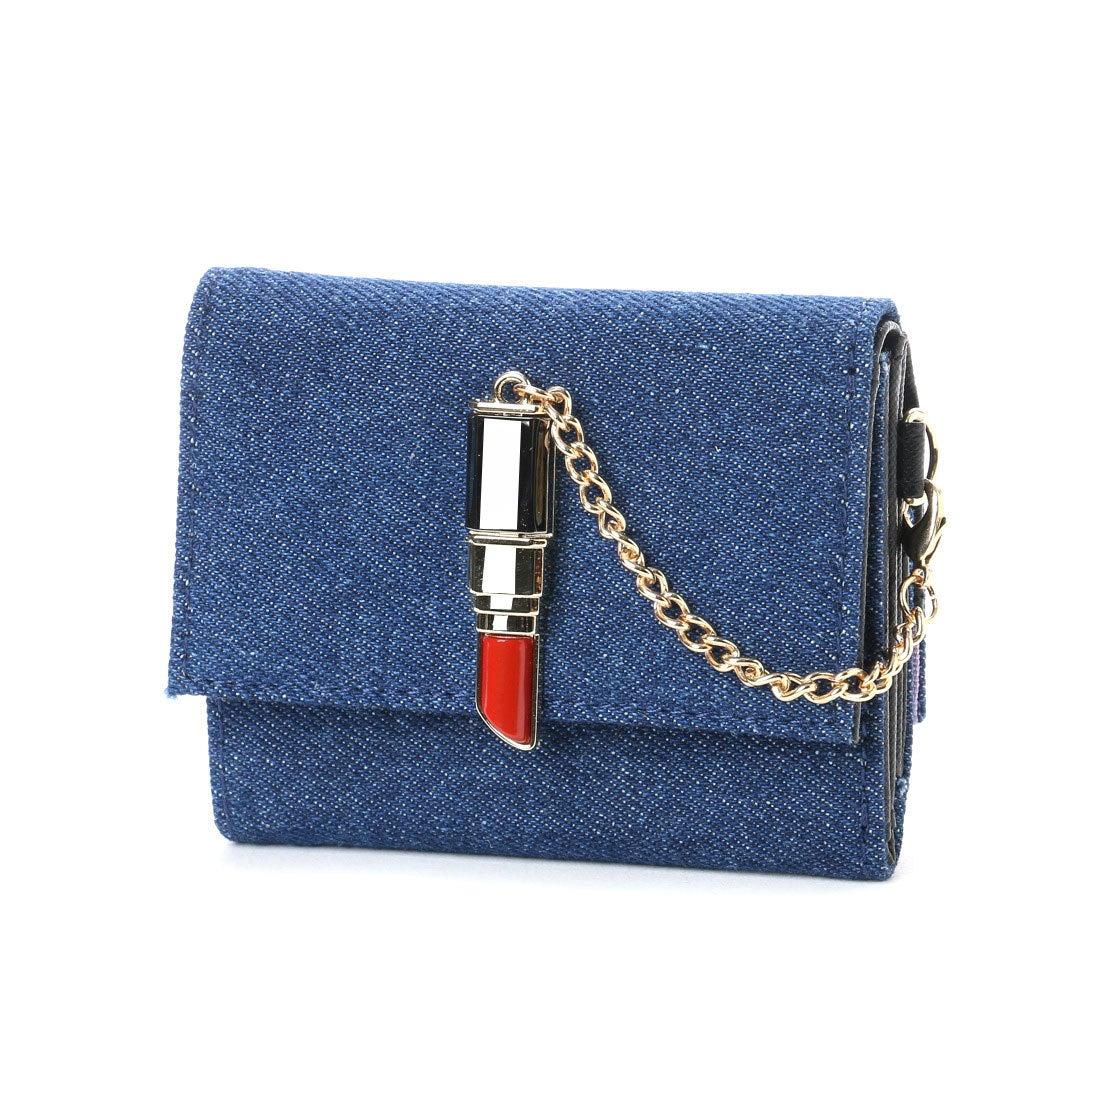 be199a92a2e8 スパイラルガール SPIRAL GIRL 口紅型金具付き折財布 (ネイビー) -レディースファッション通販 ロコンドガールズコレクション  (LOCONDO GIRL'S COLLECTION)